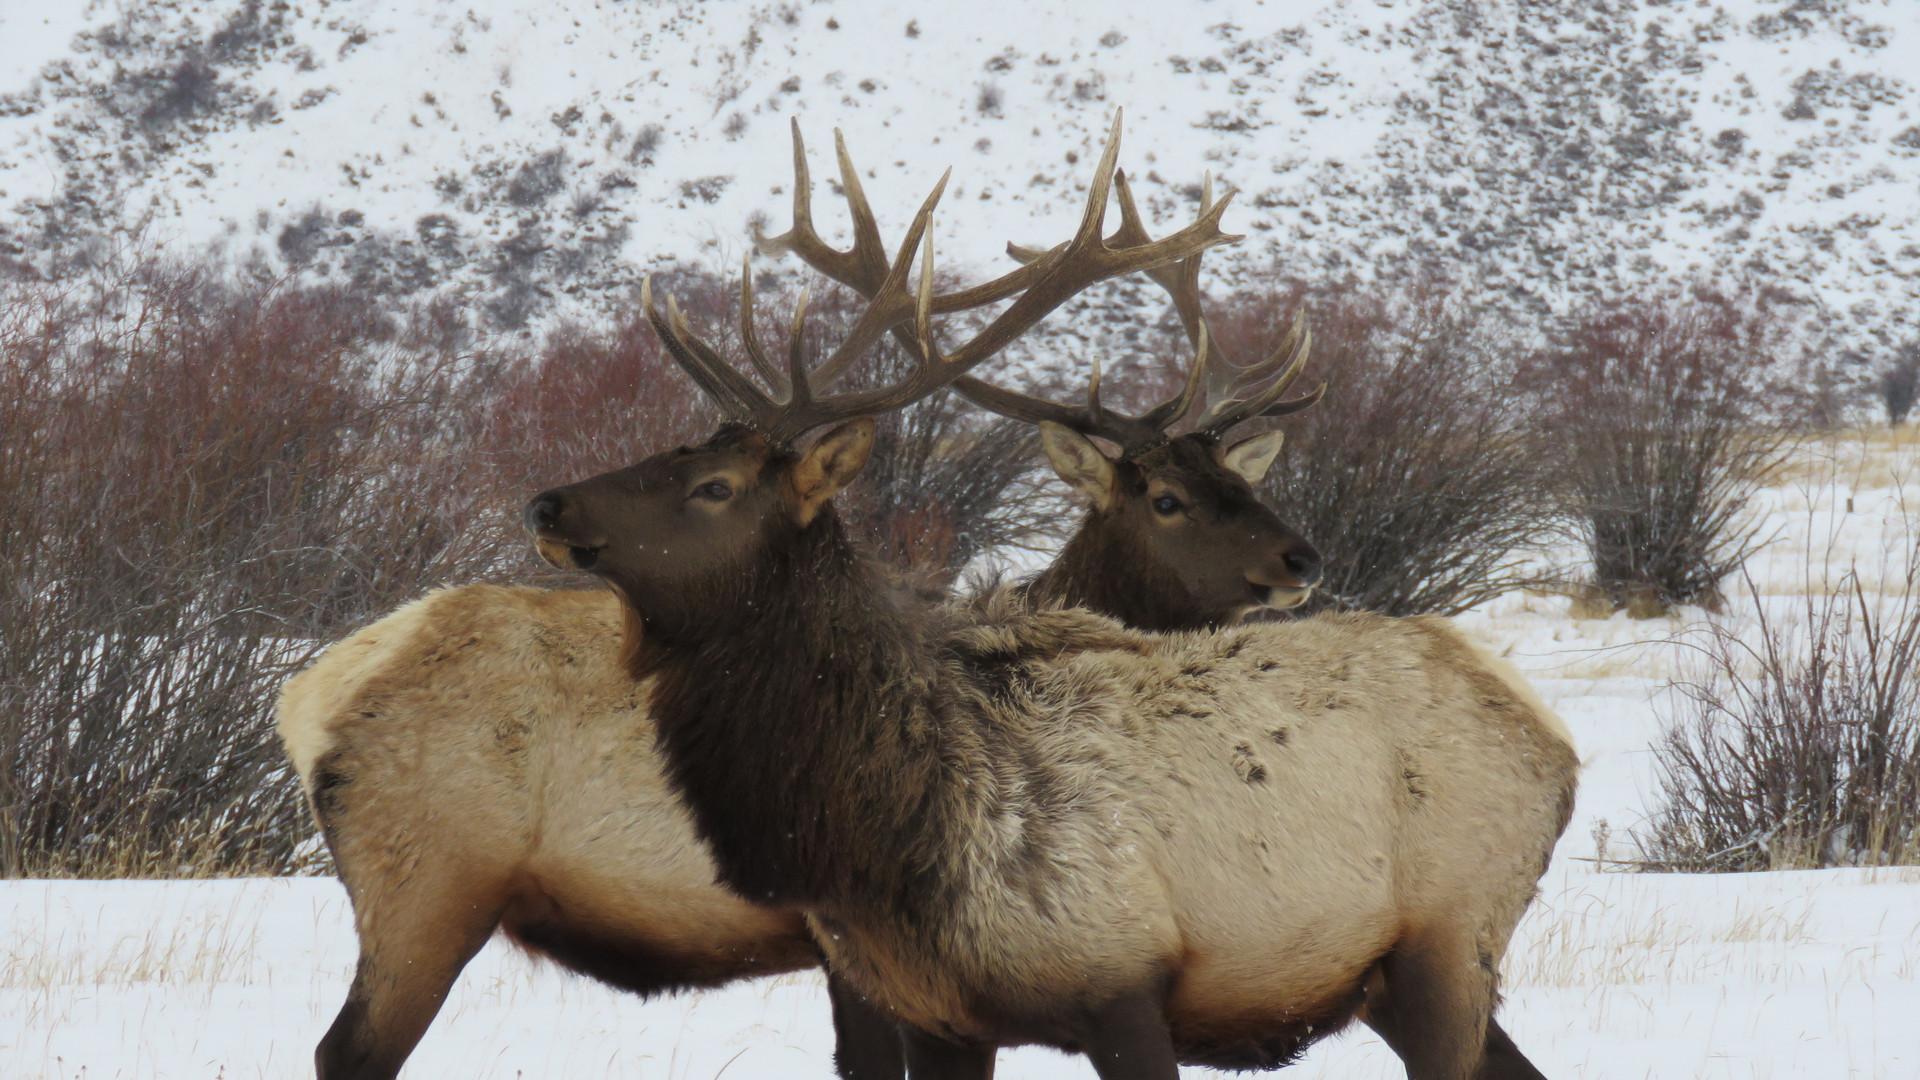 jackson-hole-wildlife-tour-elk-2 - Copy.